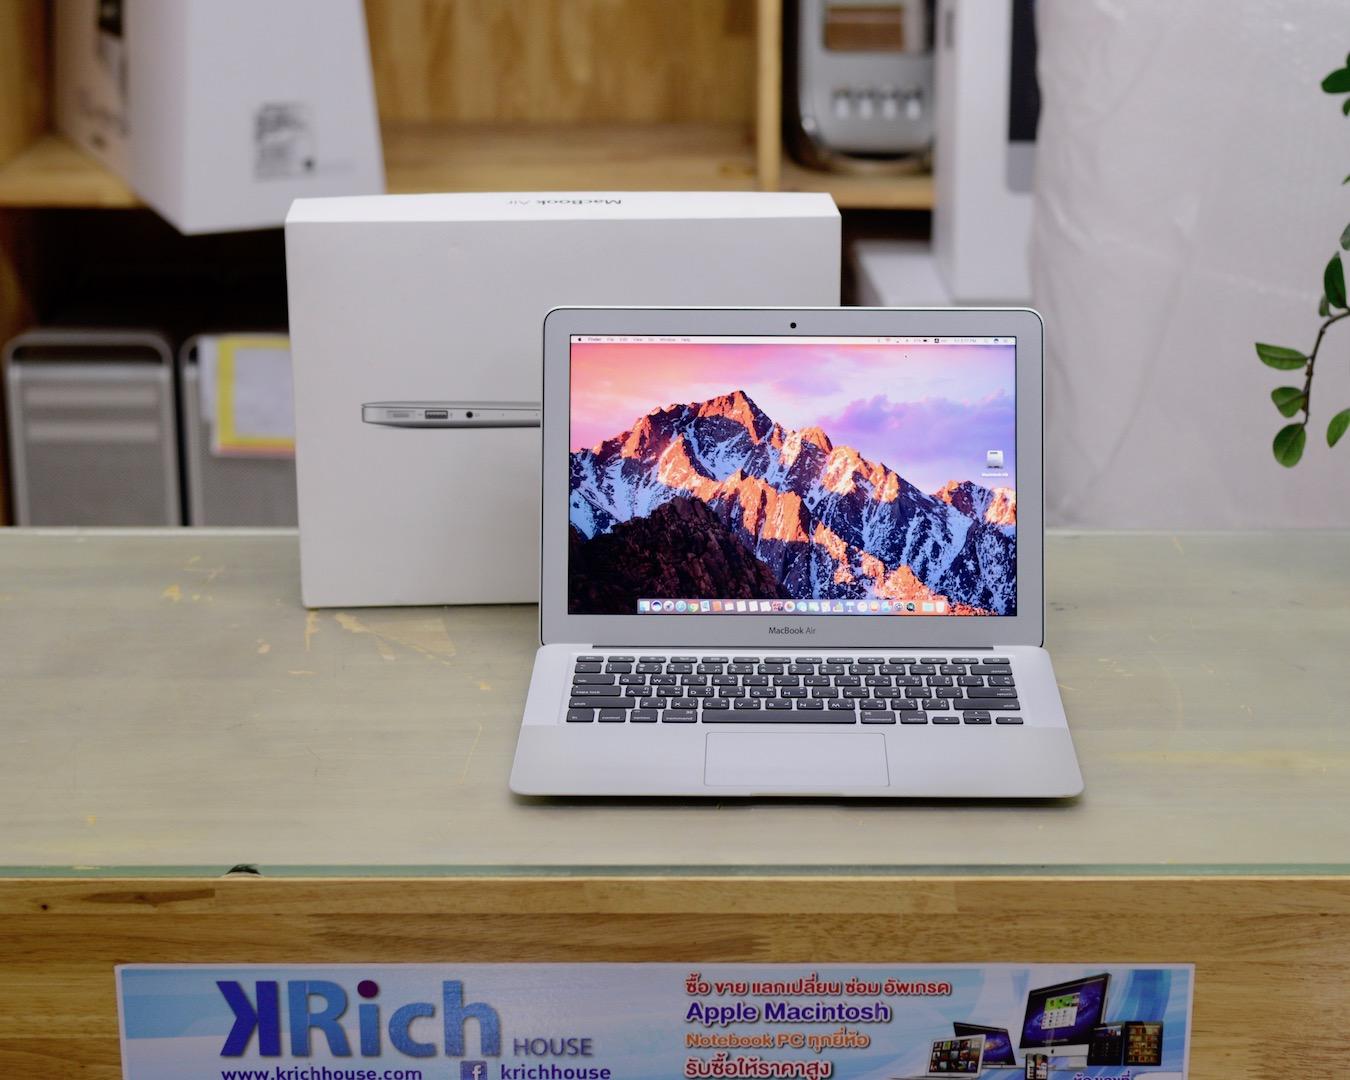 MacBook Air 13-inch CTO Mid2013 Core i7 1.7GHz RAM 8GB SSD 512GB FullBox